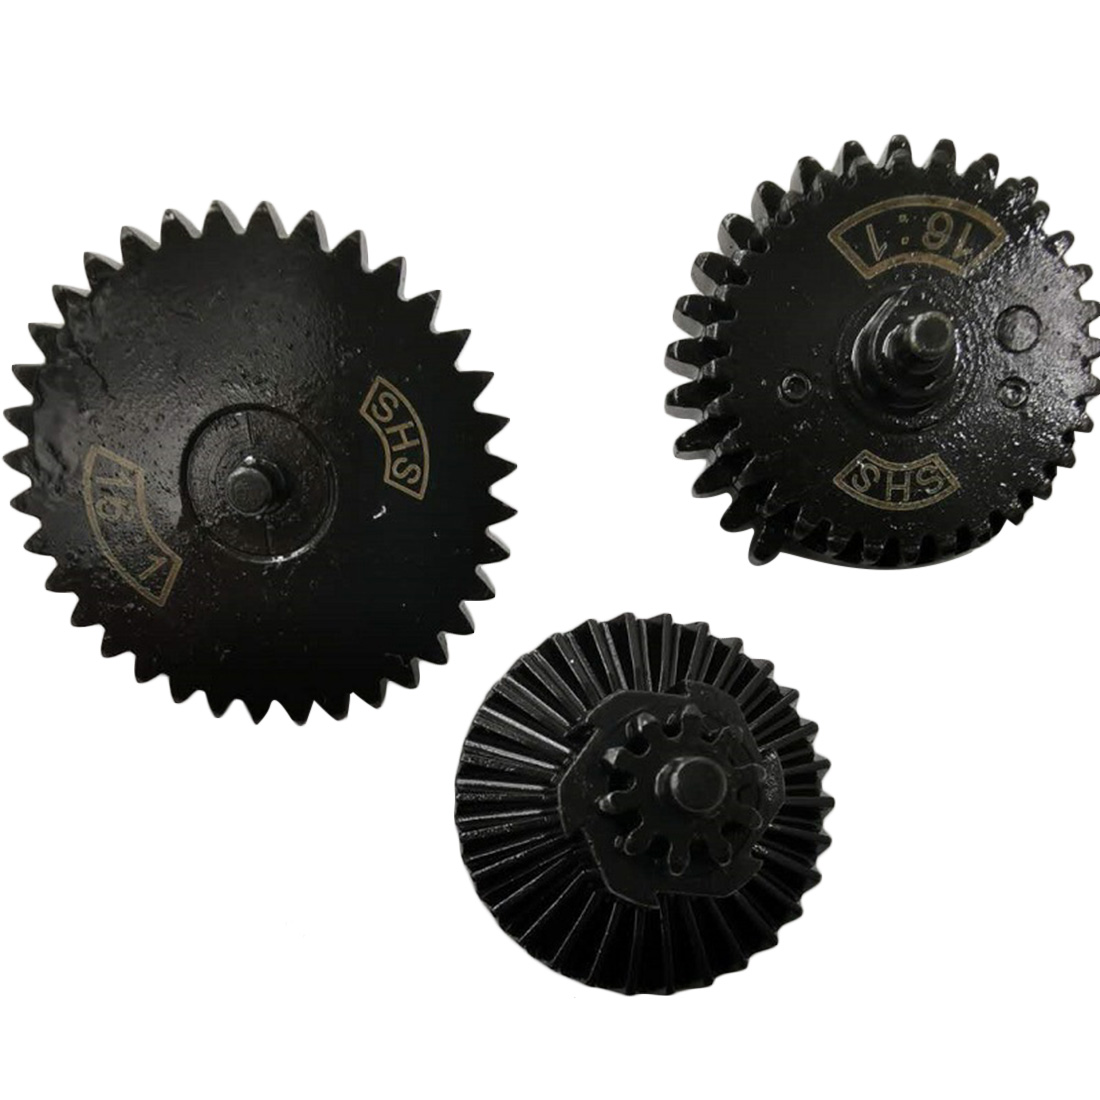 New Hot SHS 16/1 Straight Teeth Steel Gear Set For JM Gen.8 Gen.9 - Black